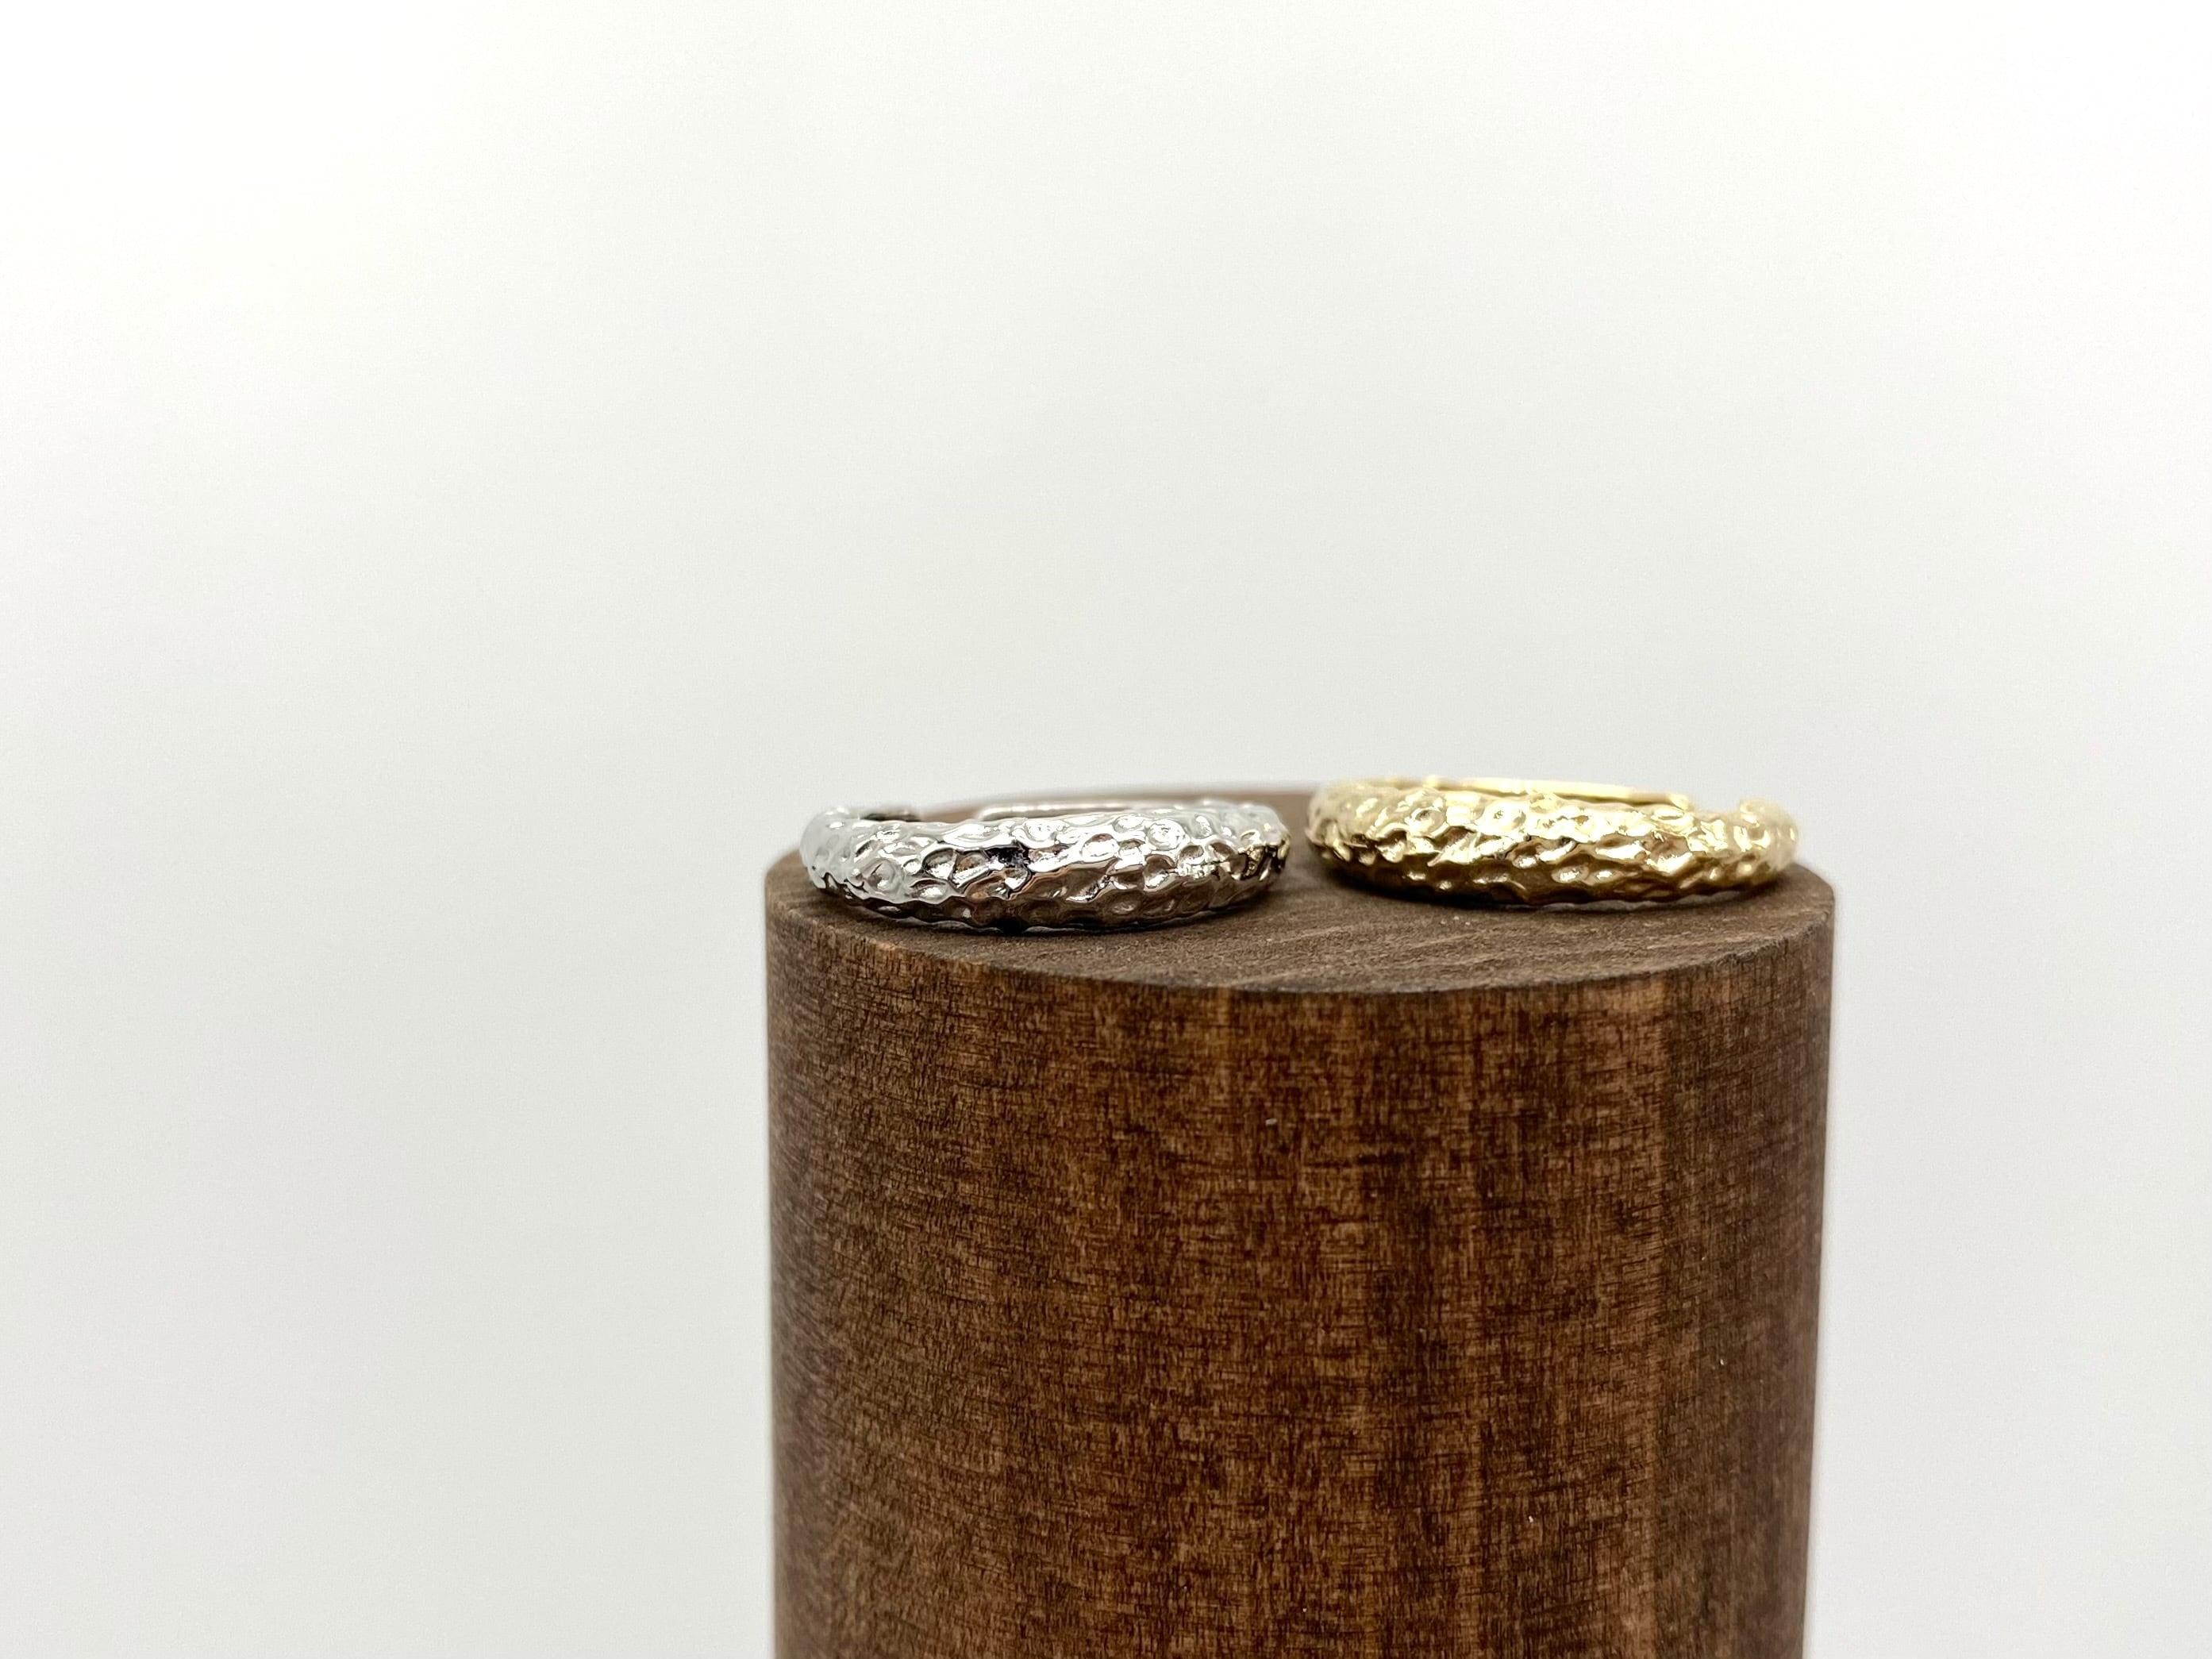 Corail ear cuff ー gold / silver ー